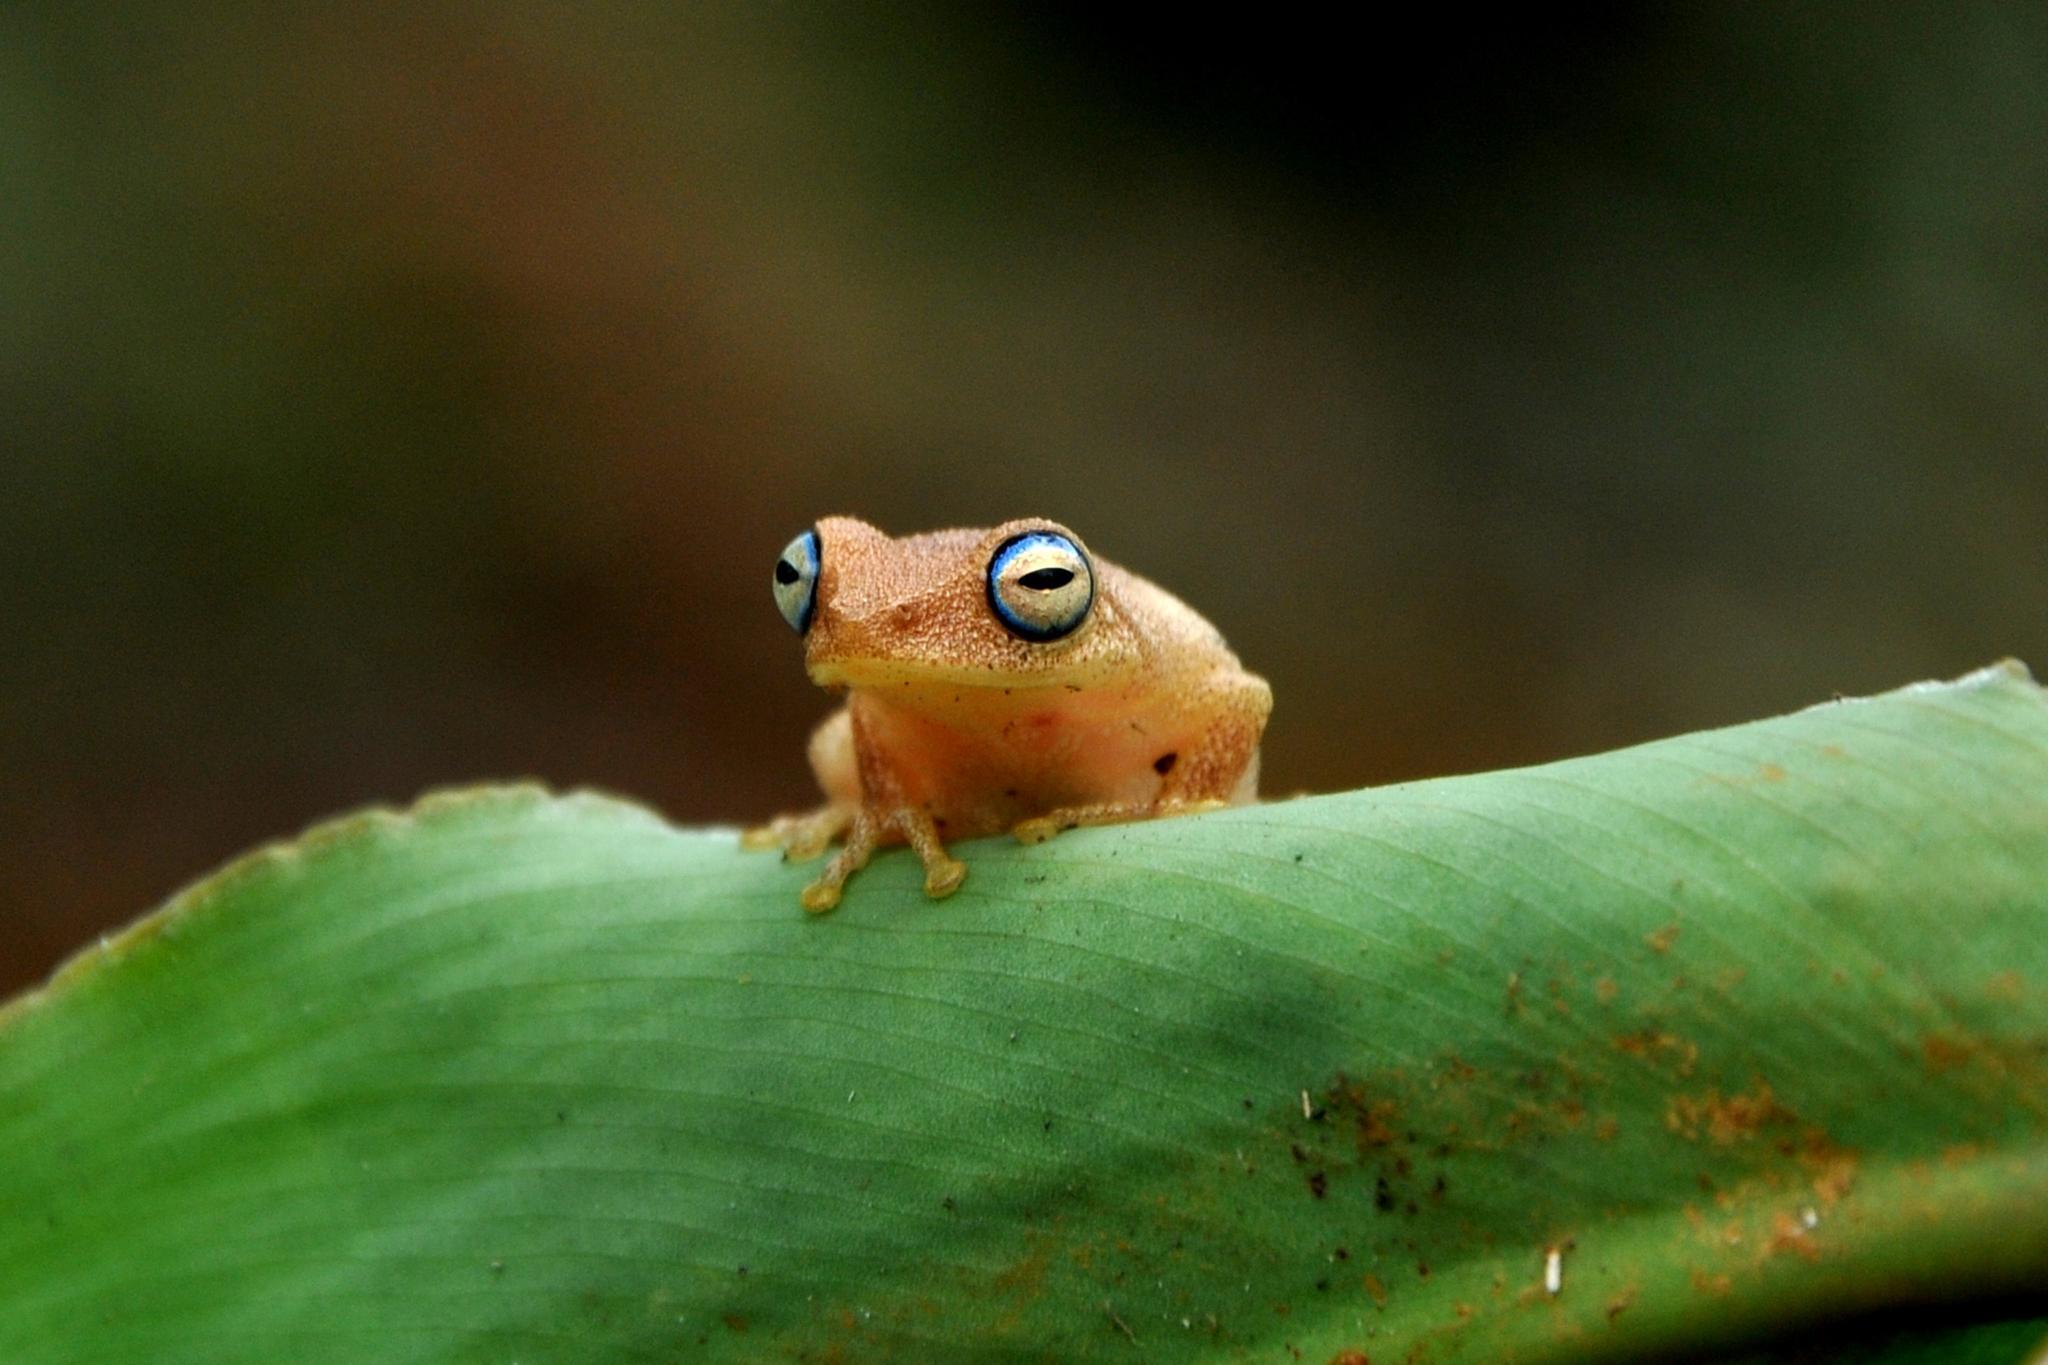 2_Anita Kindre_Blue eyed bush frog by Anita Kindre